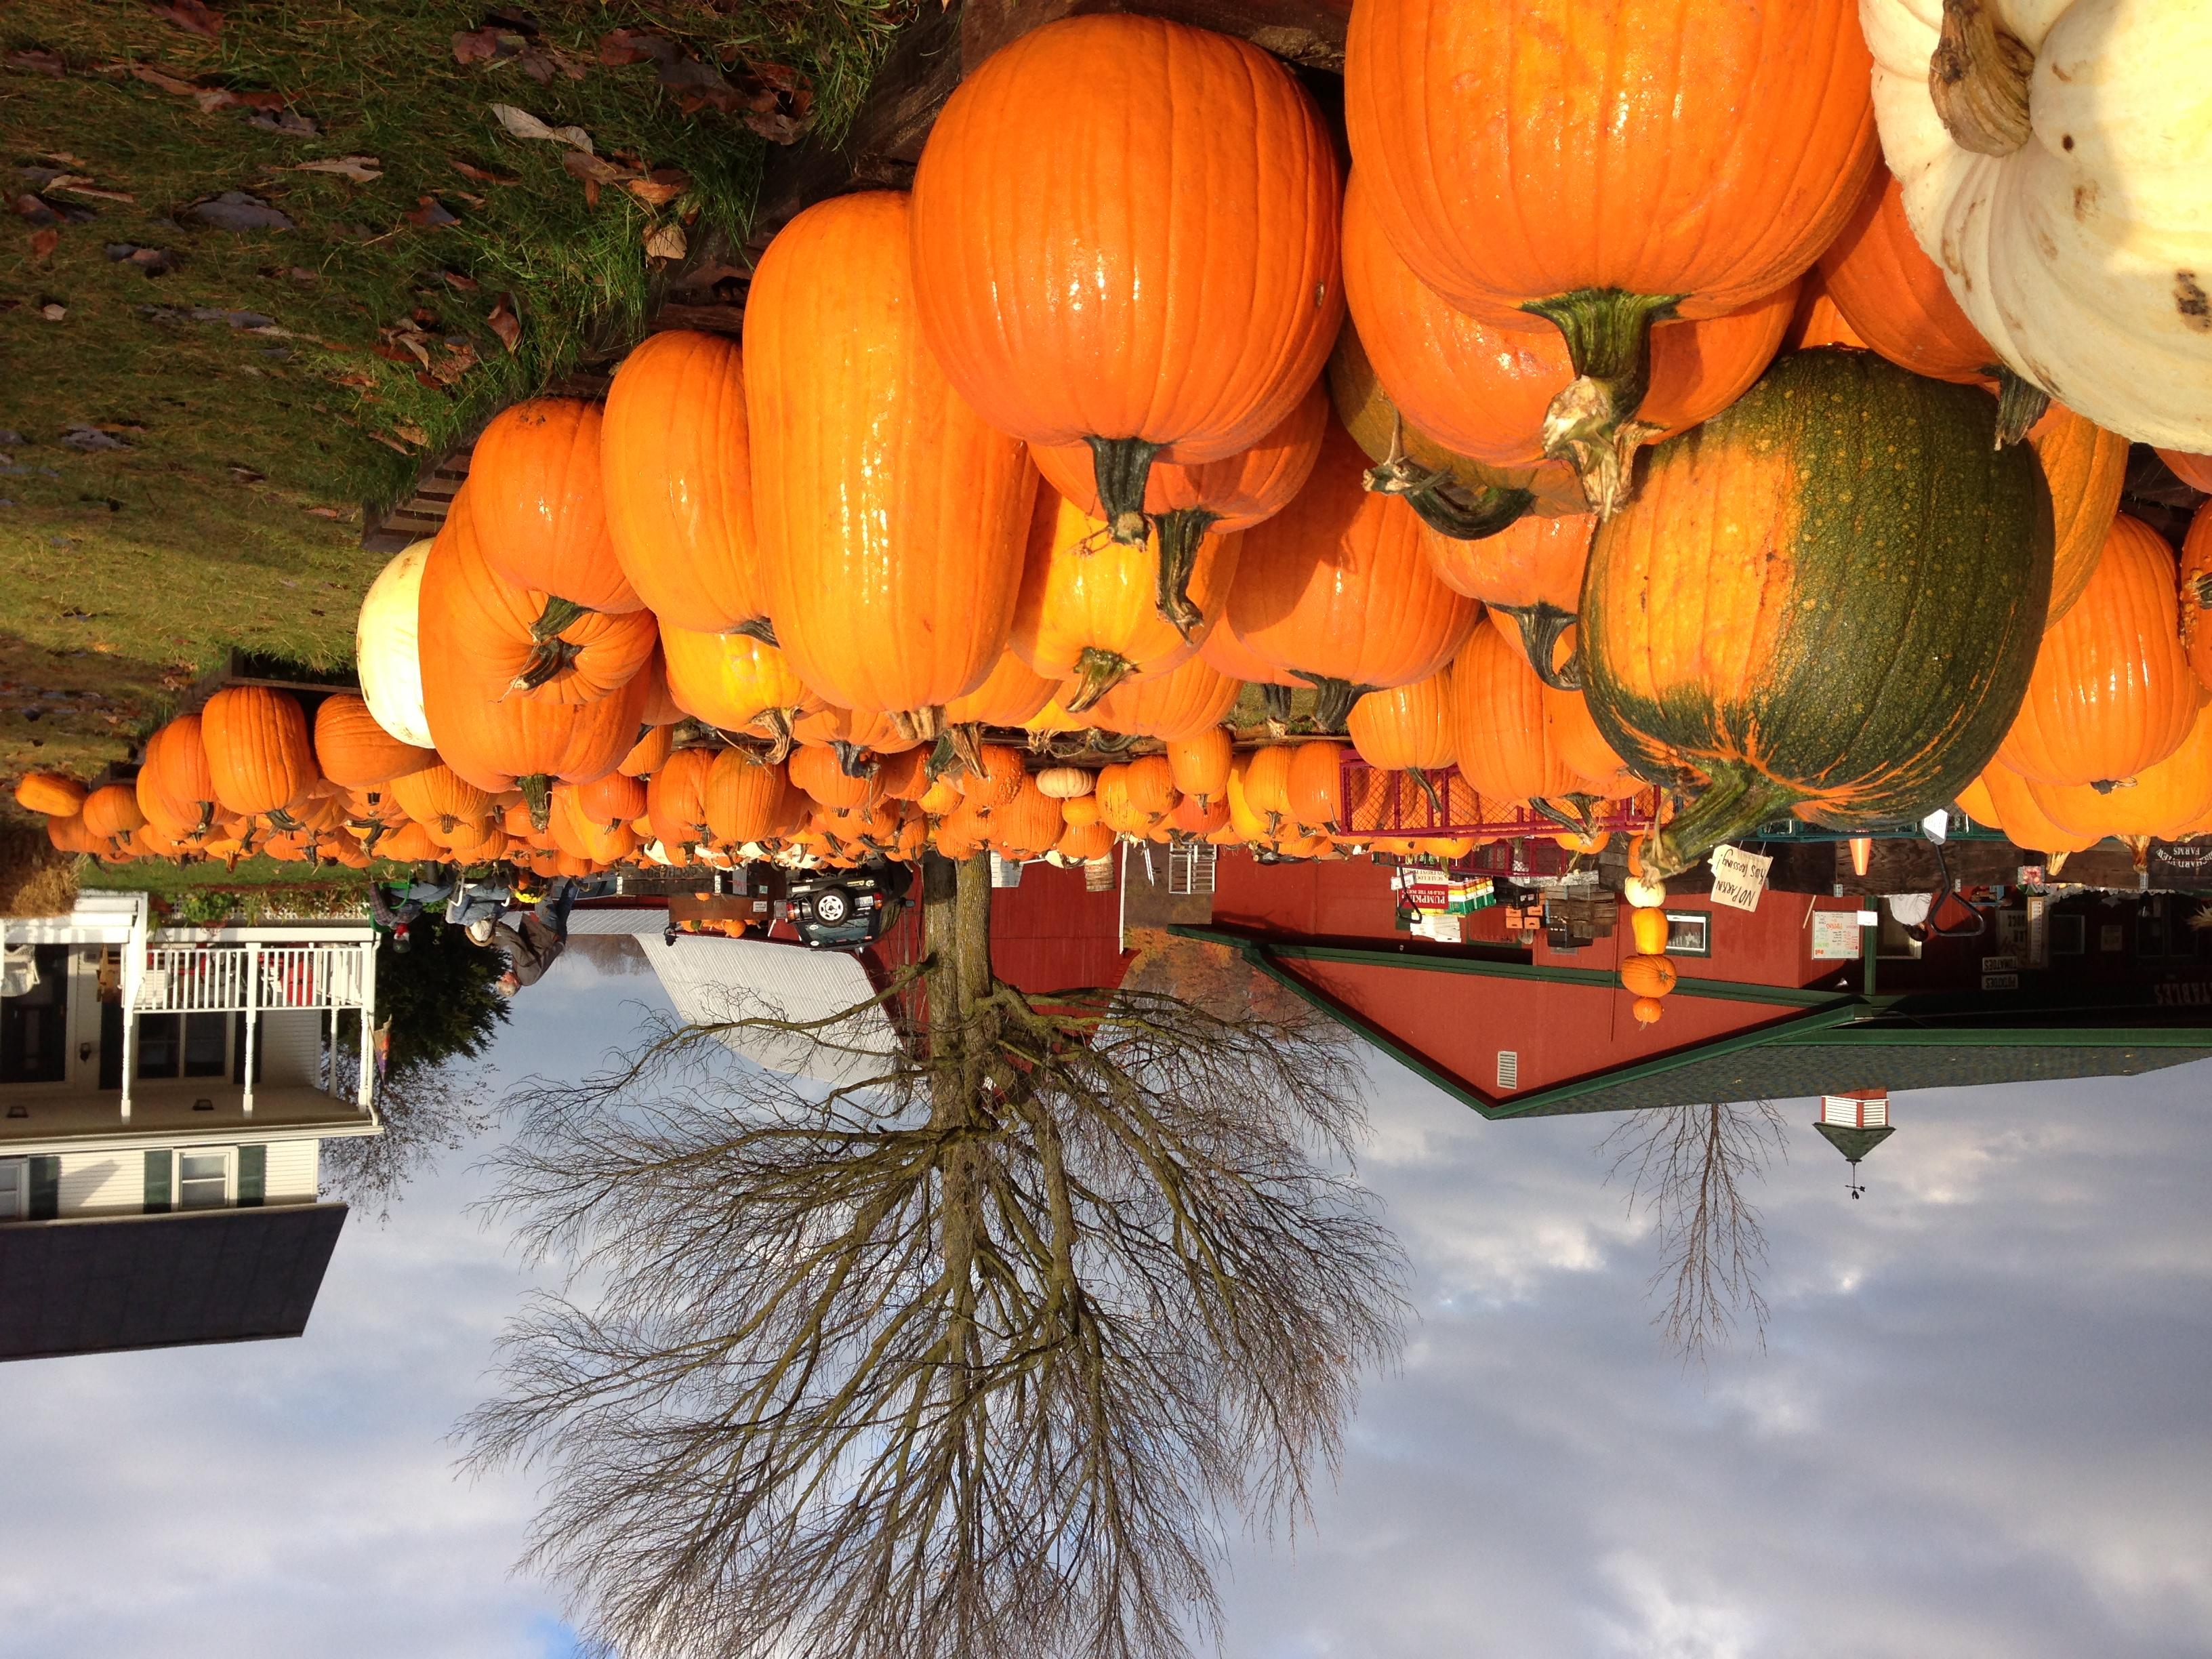 Pumpkins and farm house